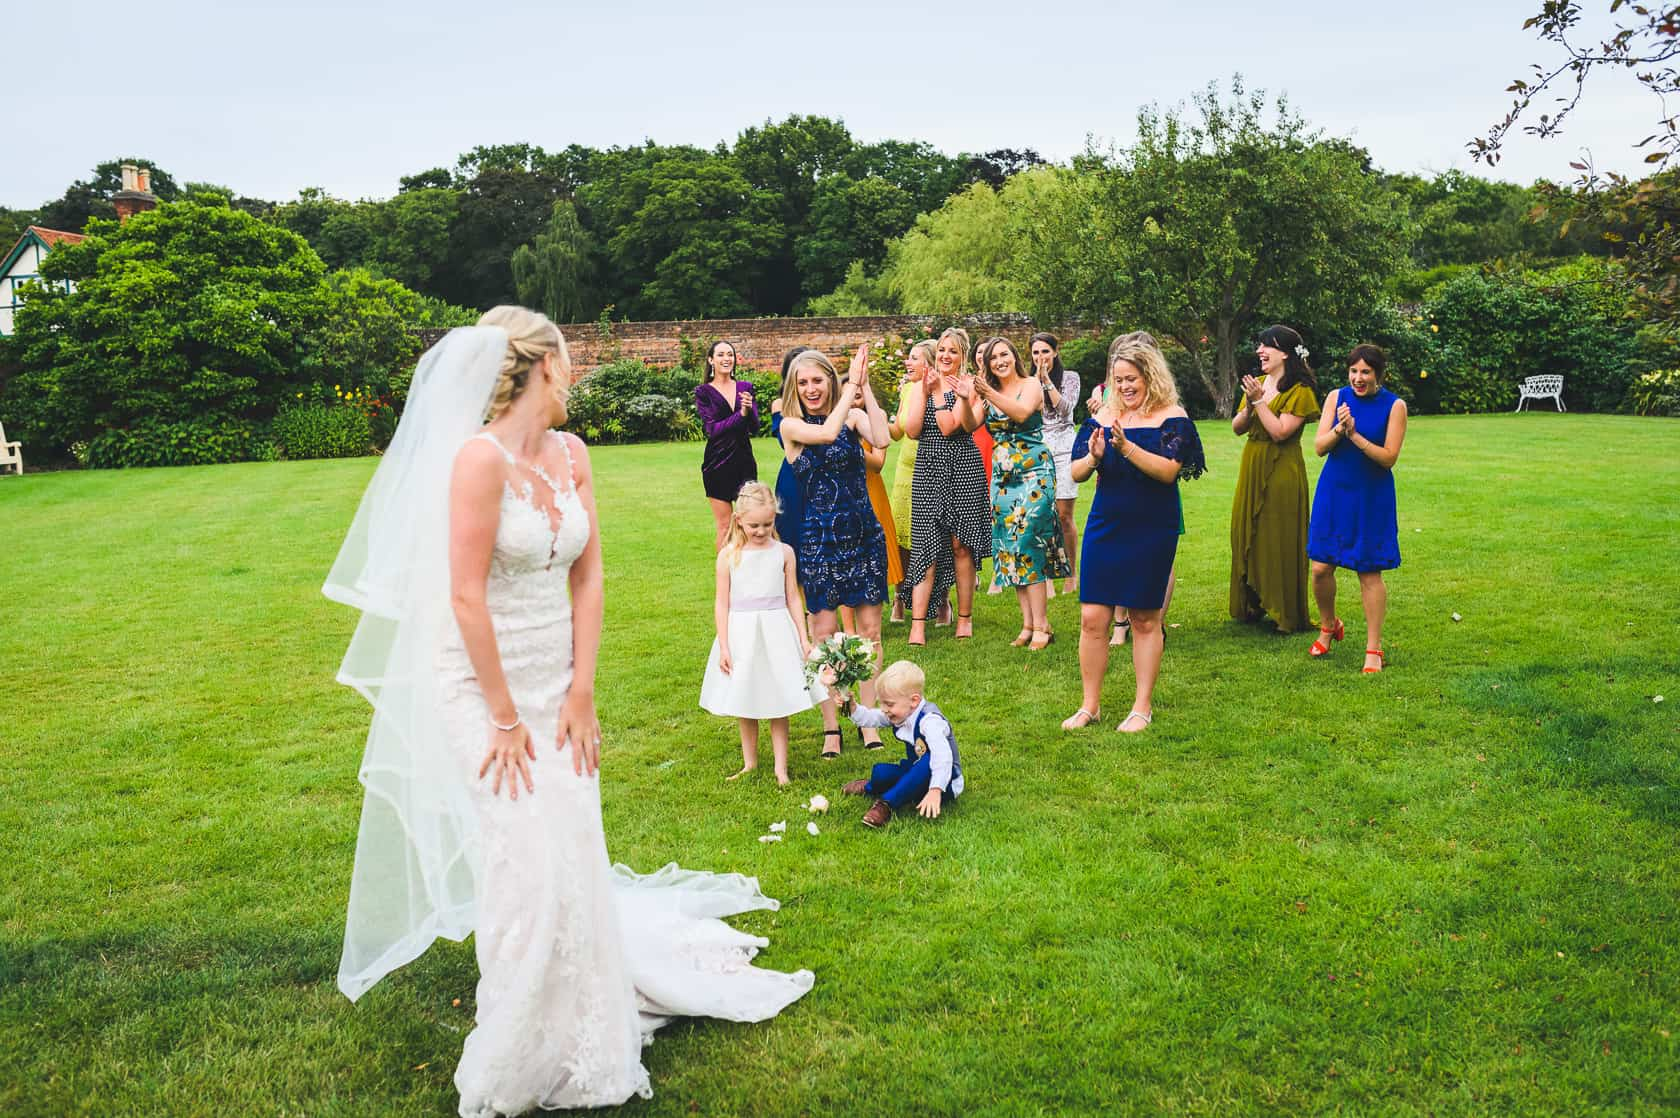 Best_Wedding_Photography_2019_Wedding-Photographer-Essex_089